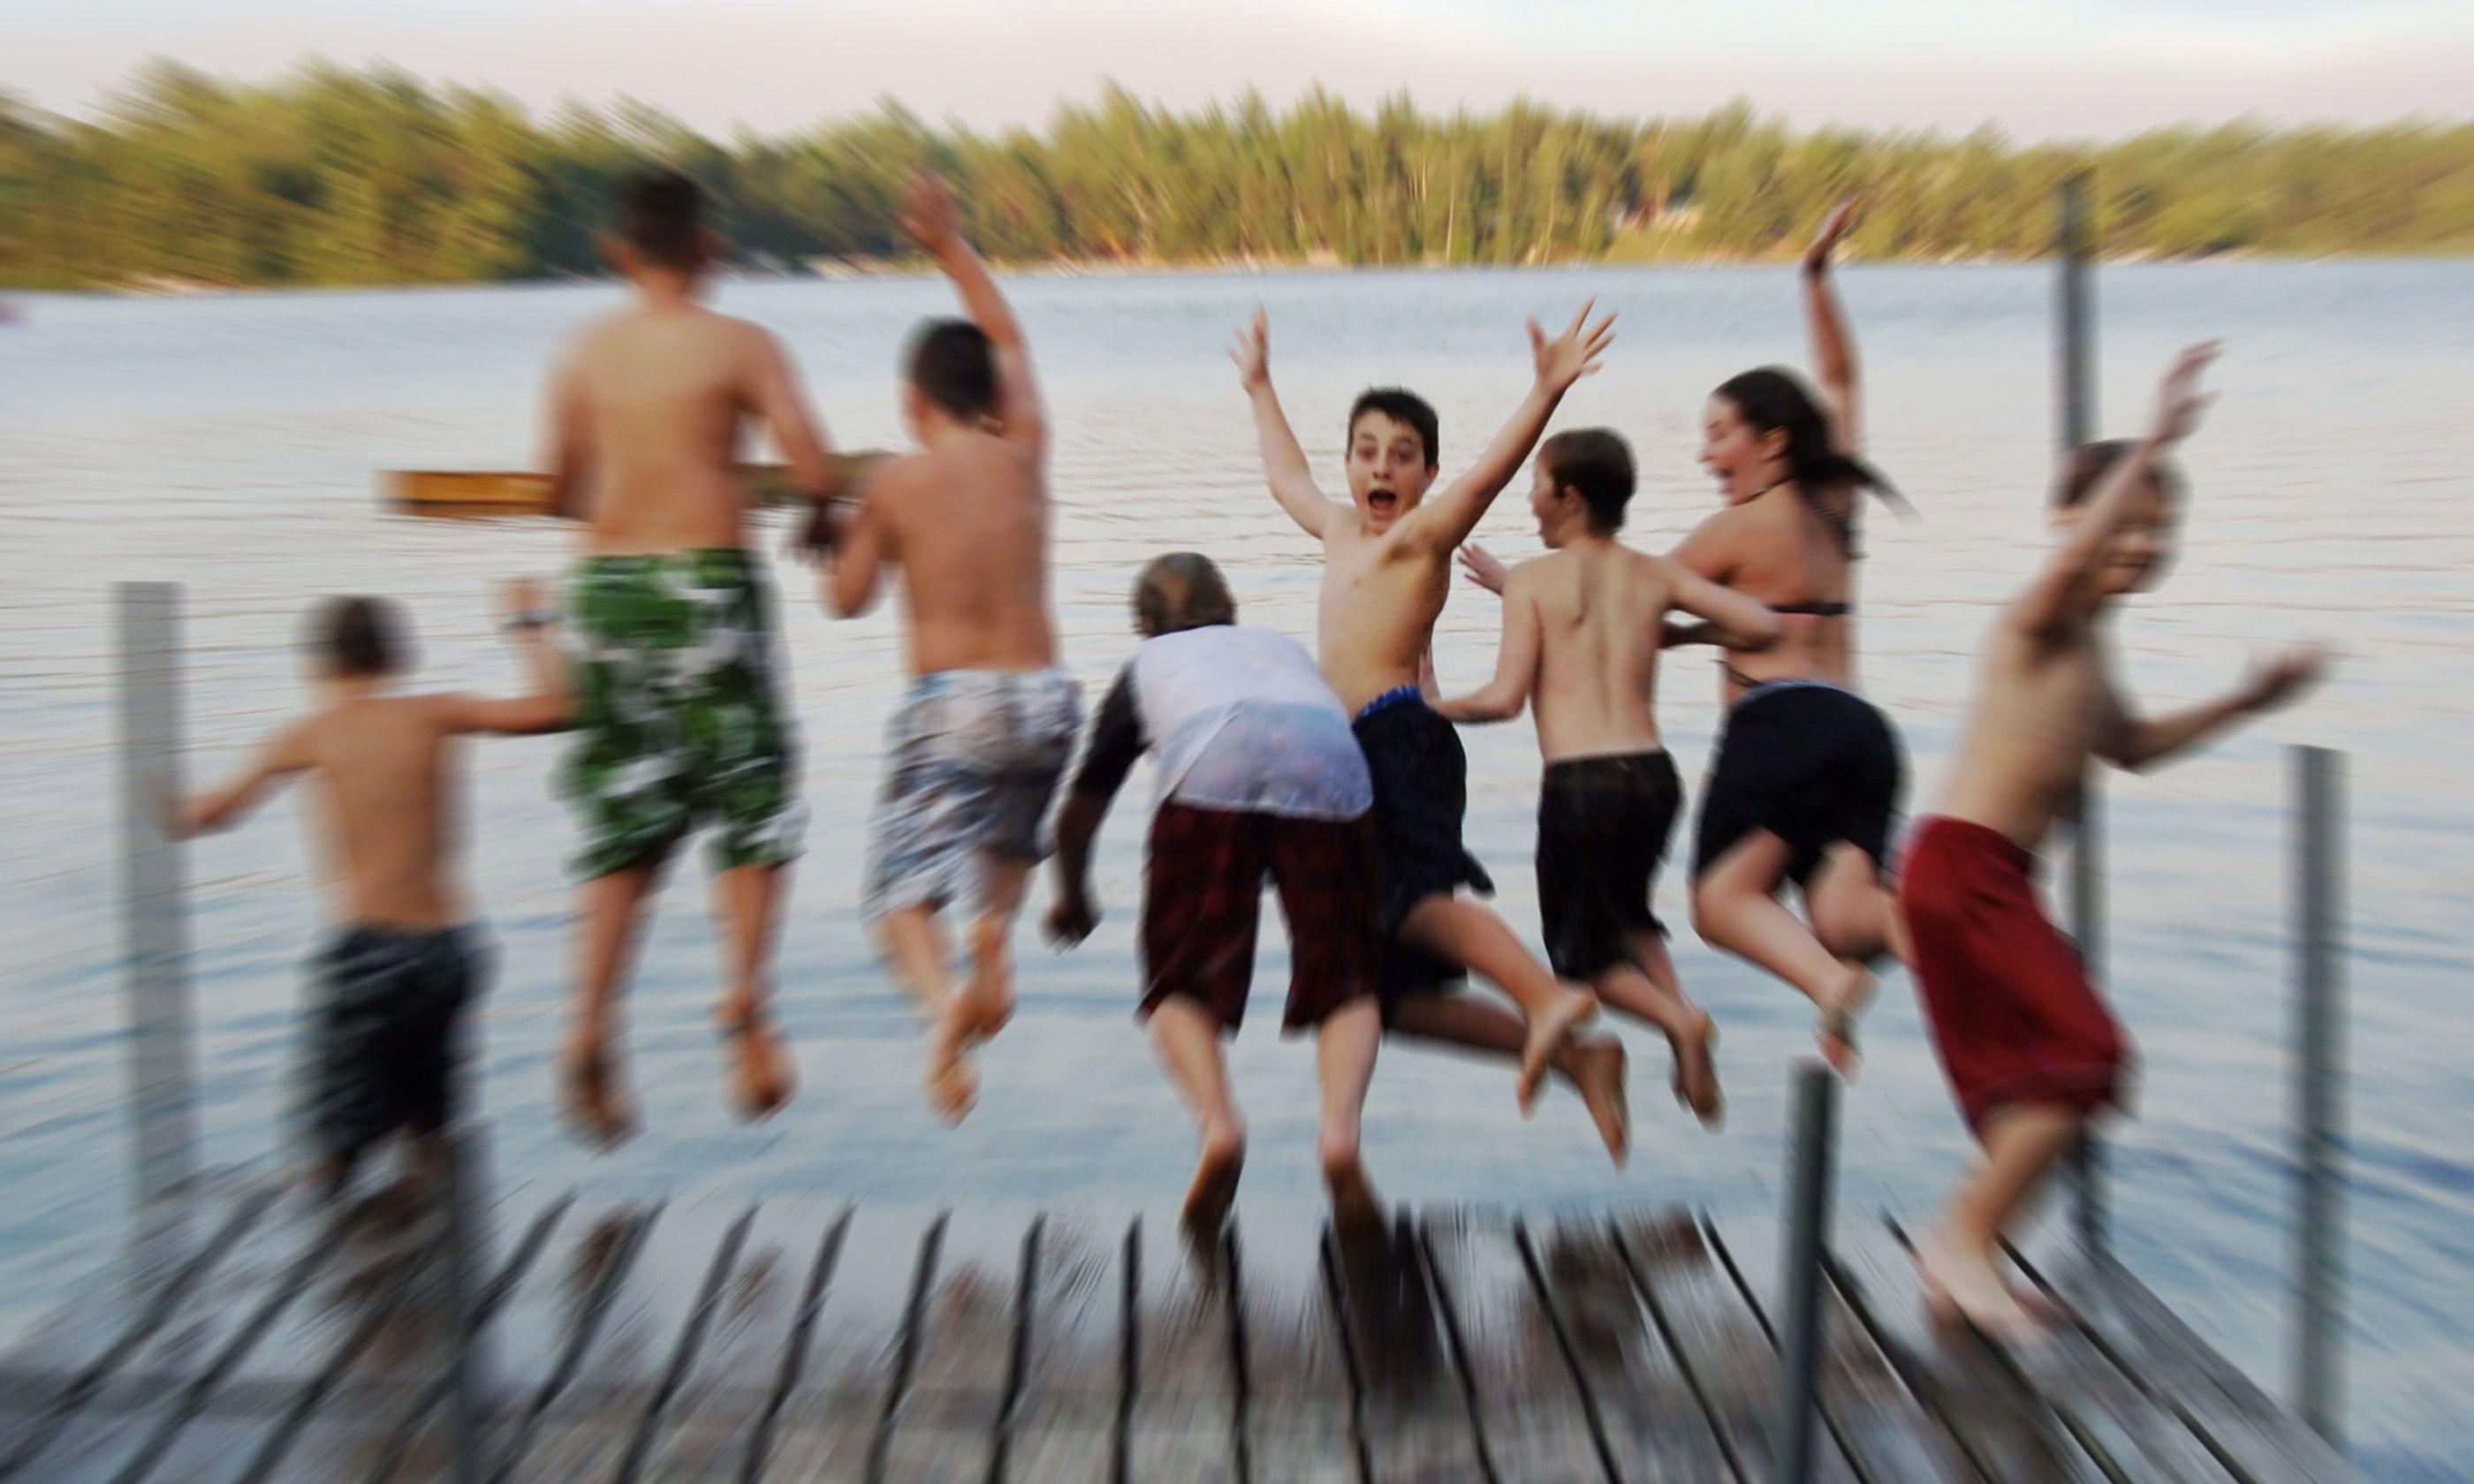 Kids jumping into lake (Dreamstime)